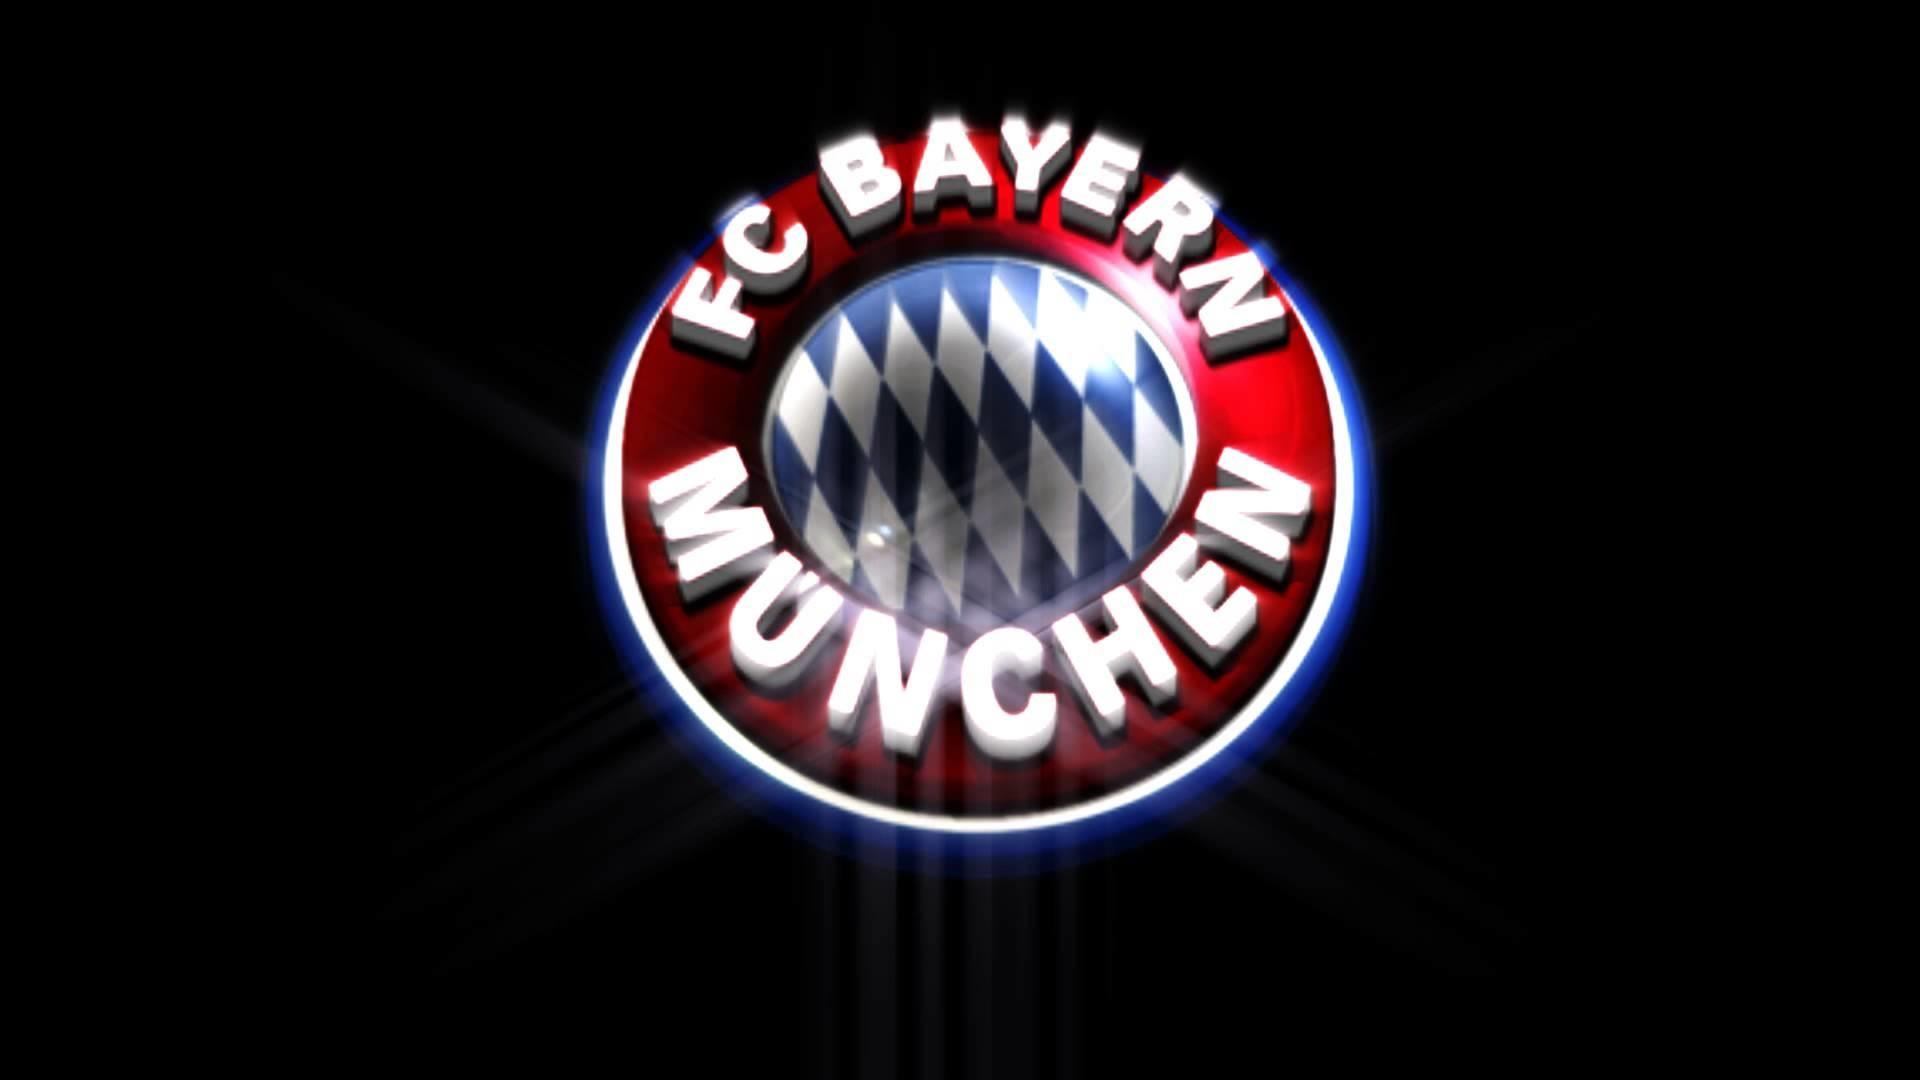 16 Luxury Pubg Wallpaper Iphone 6: Bayern Munich Logo Wallpaper (73+ Images